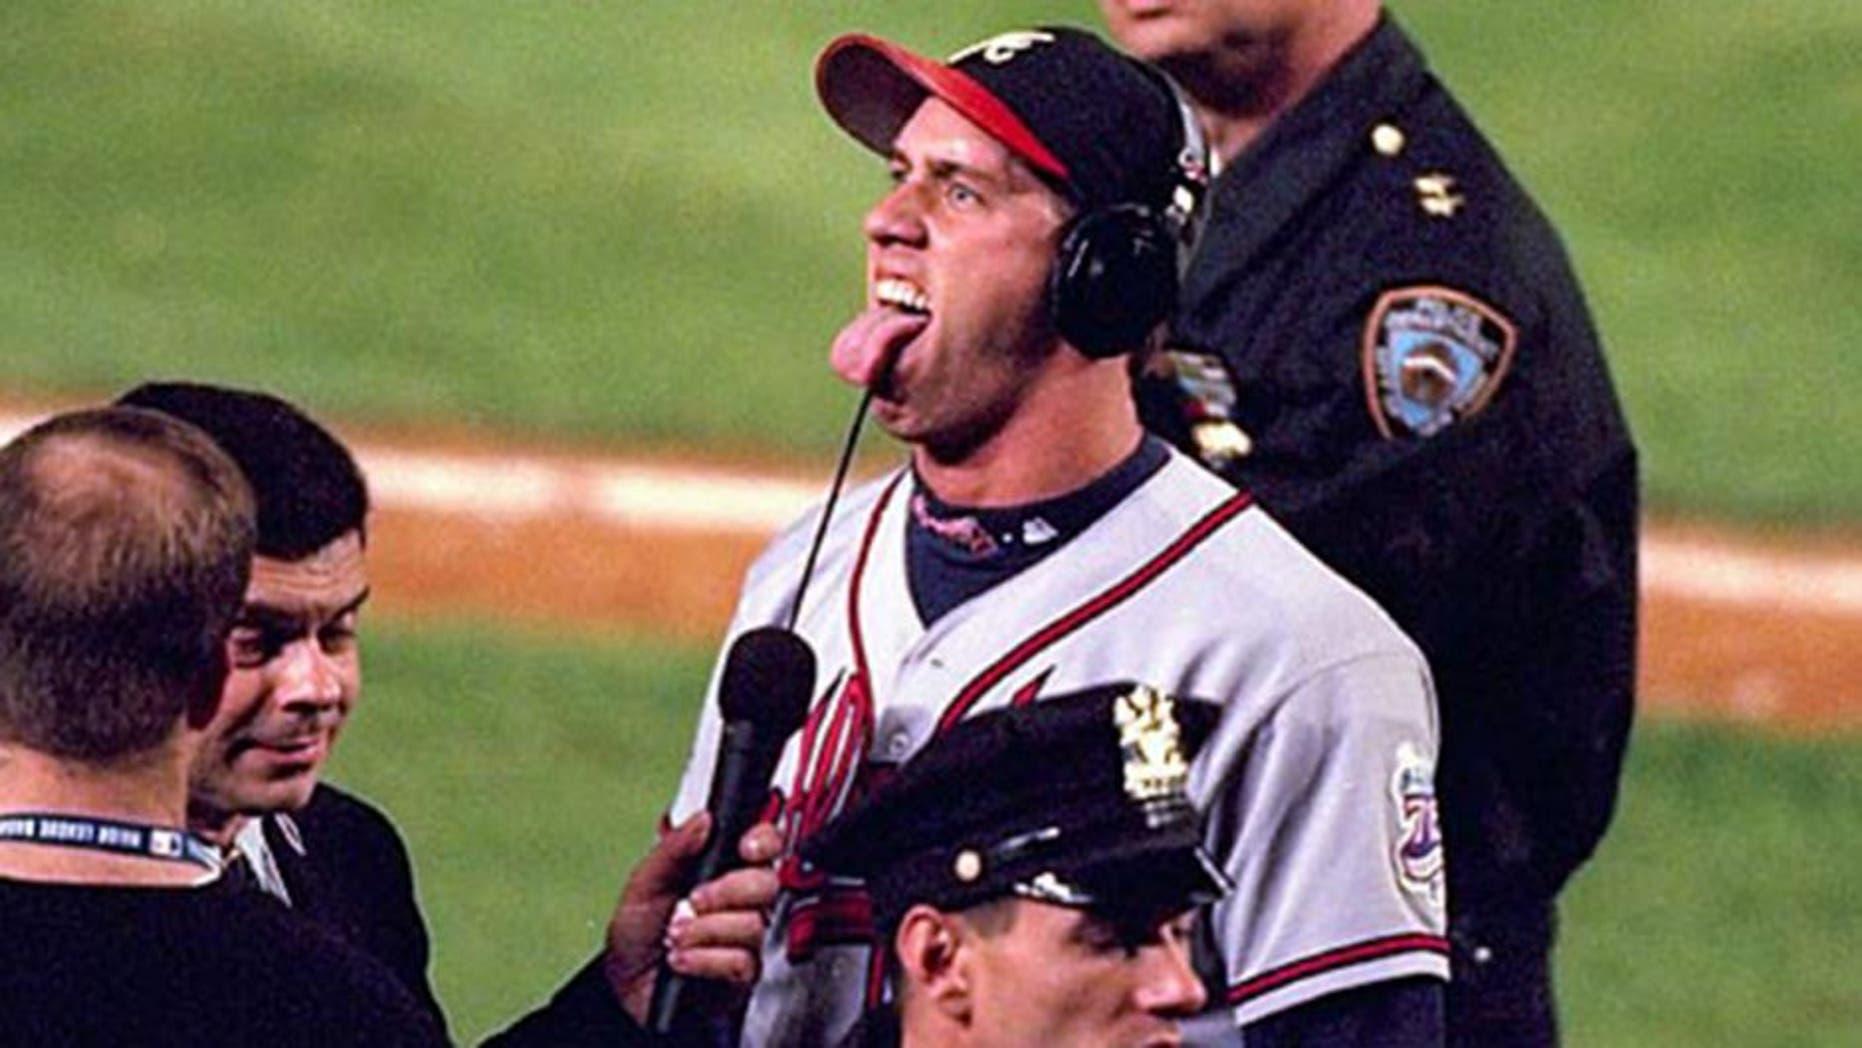 Baseball: NLCS Playoffs. Atlanta Braves John Rocker (49) taunting and gesturing fans during media interview after Game 5 vs New York Mets. Flushing, NY 10/17/1999 MANDATORY CREDIT: Al Tielemans/Sports Illustrated SetNumber: X58920